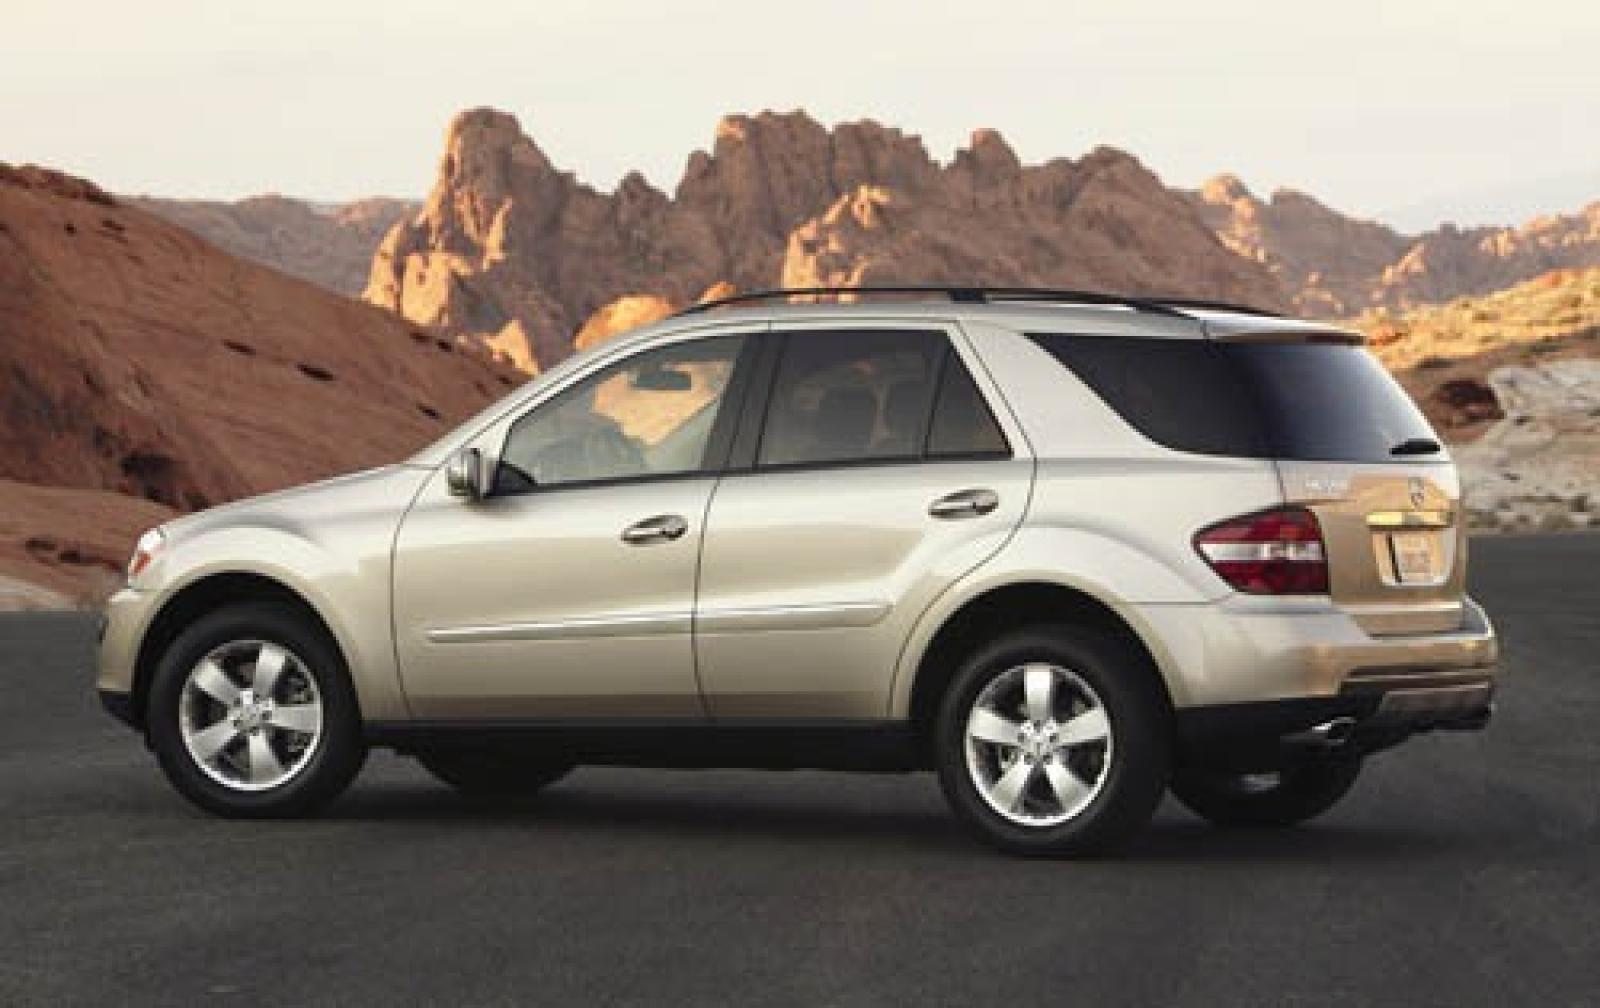 2007 mercedes benz m class information and photos for Mercedes benz 2007 models